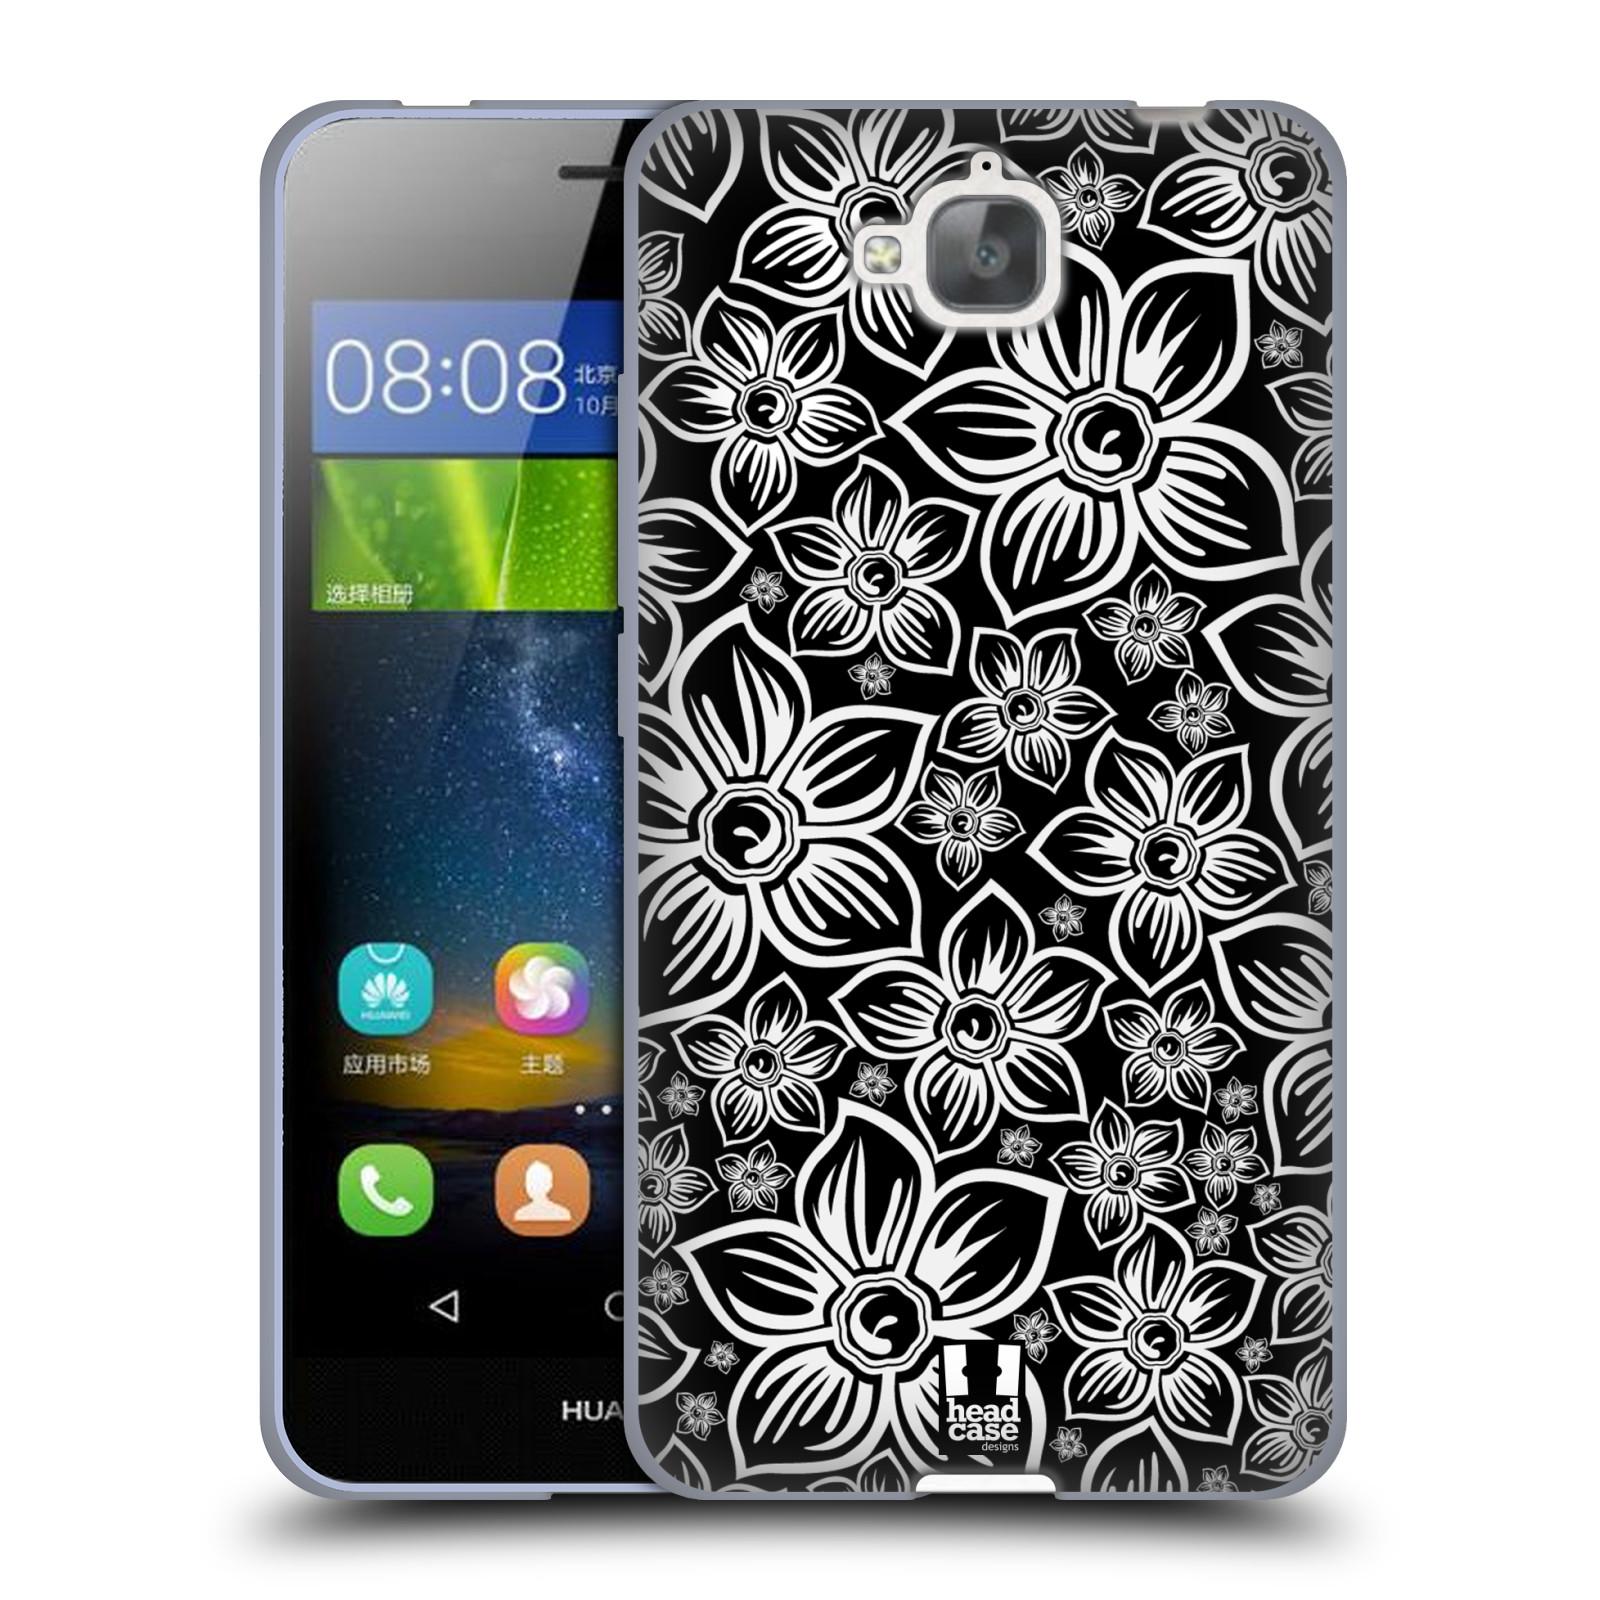 Silikonové pouzdro na mobil Huawei Y6 Pro Dual Sim HEAD CASE FLORAL DAISY